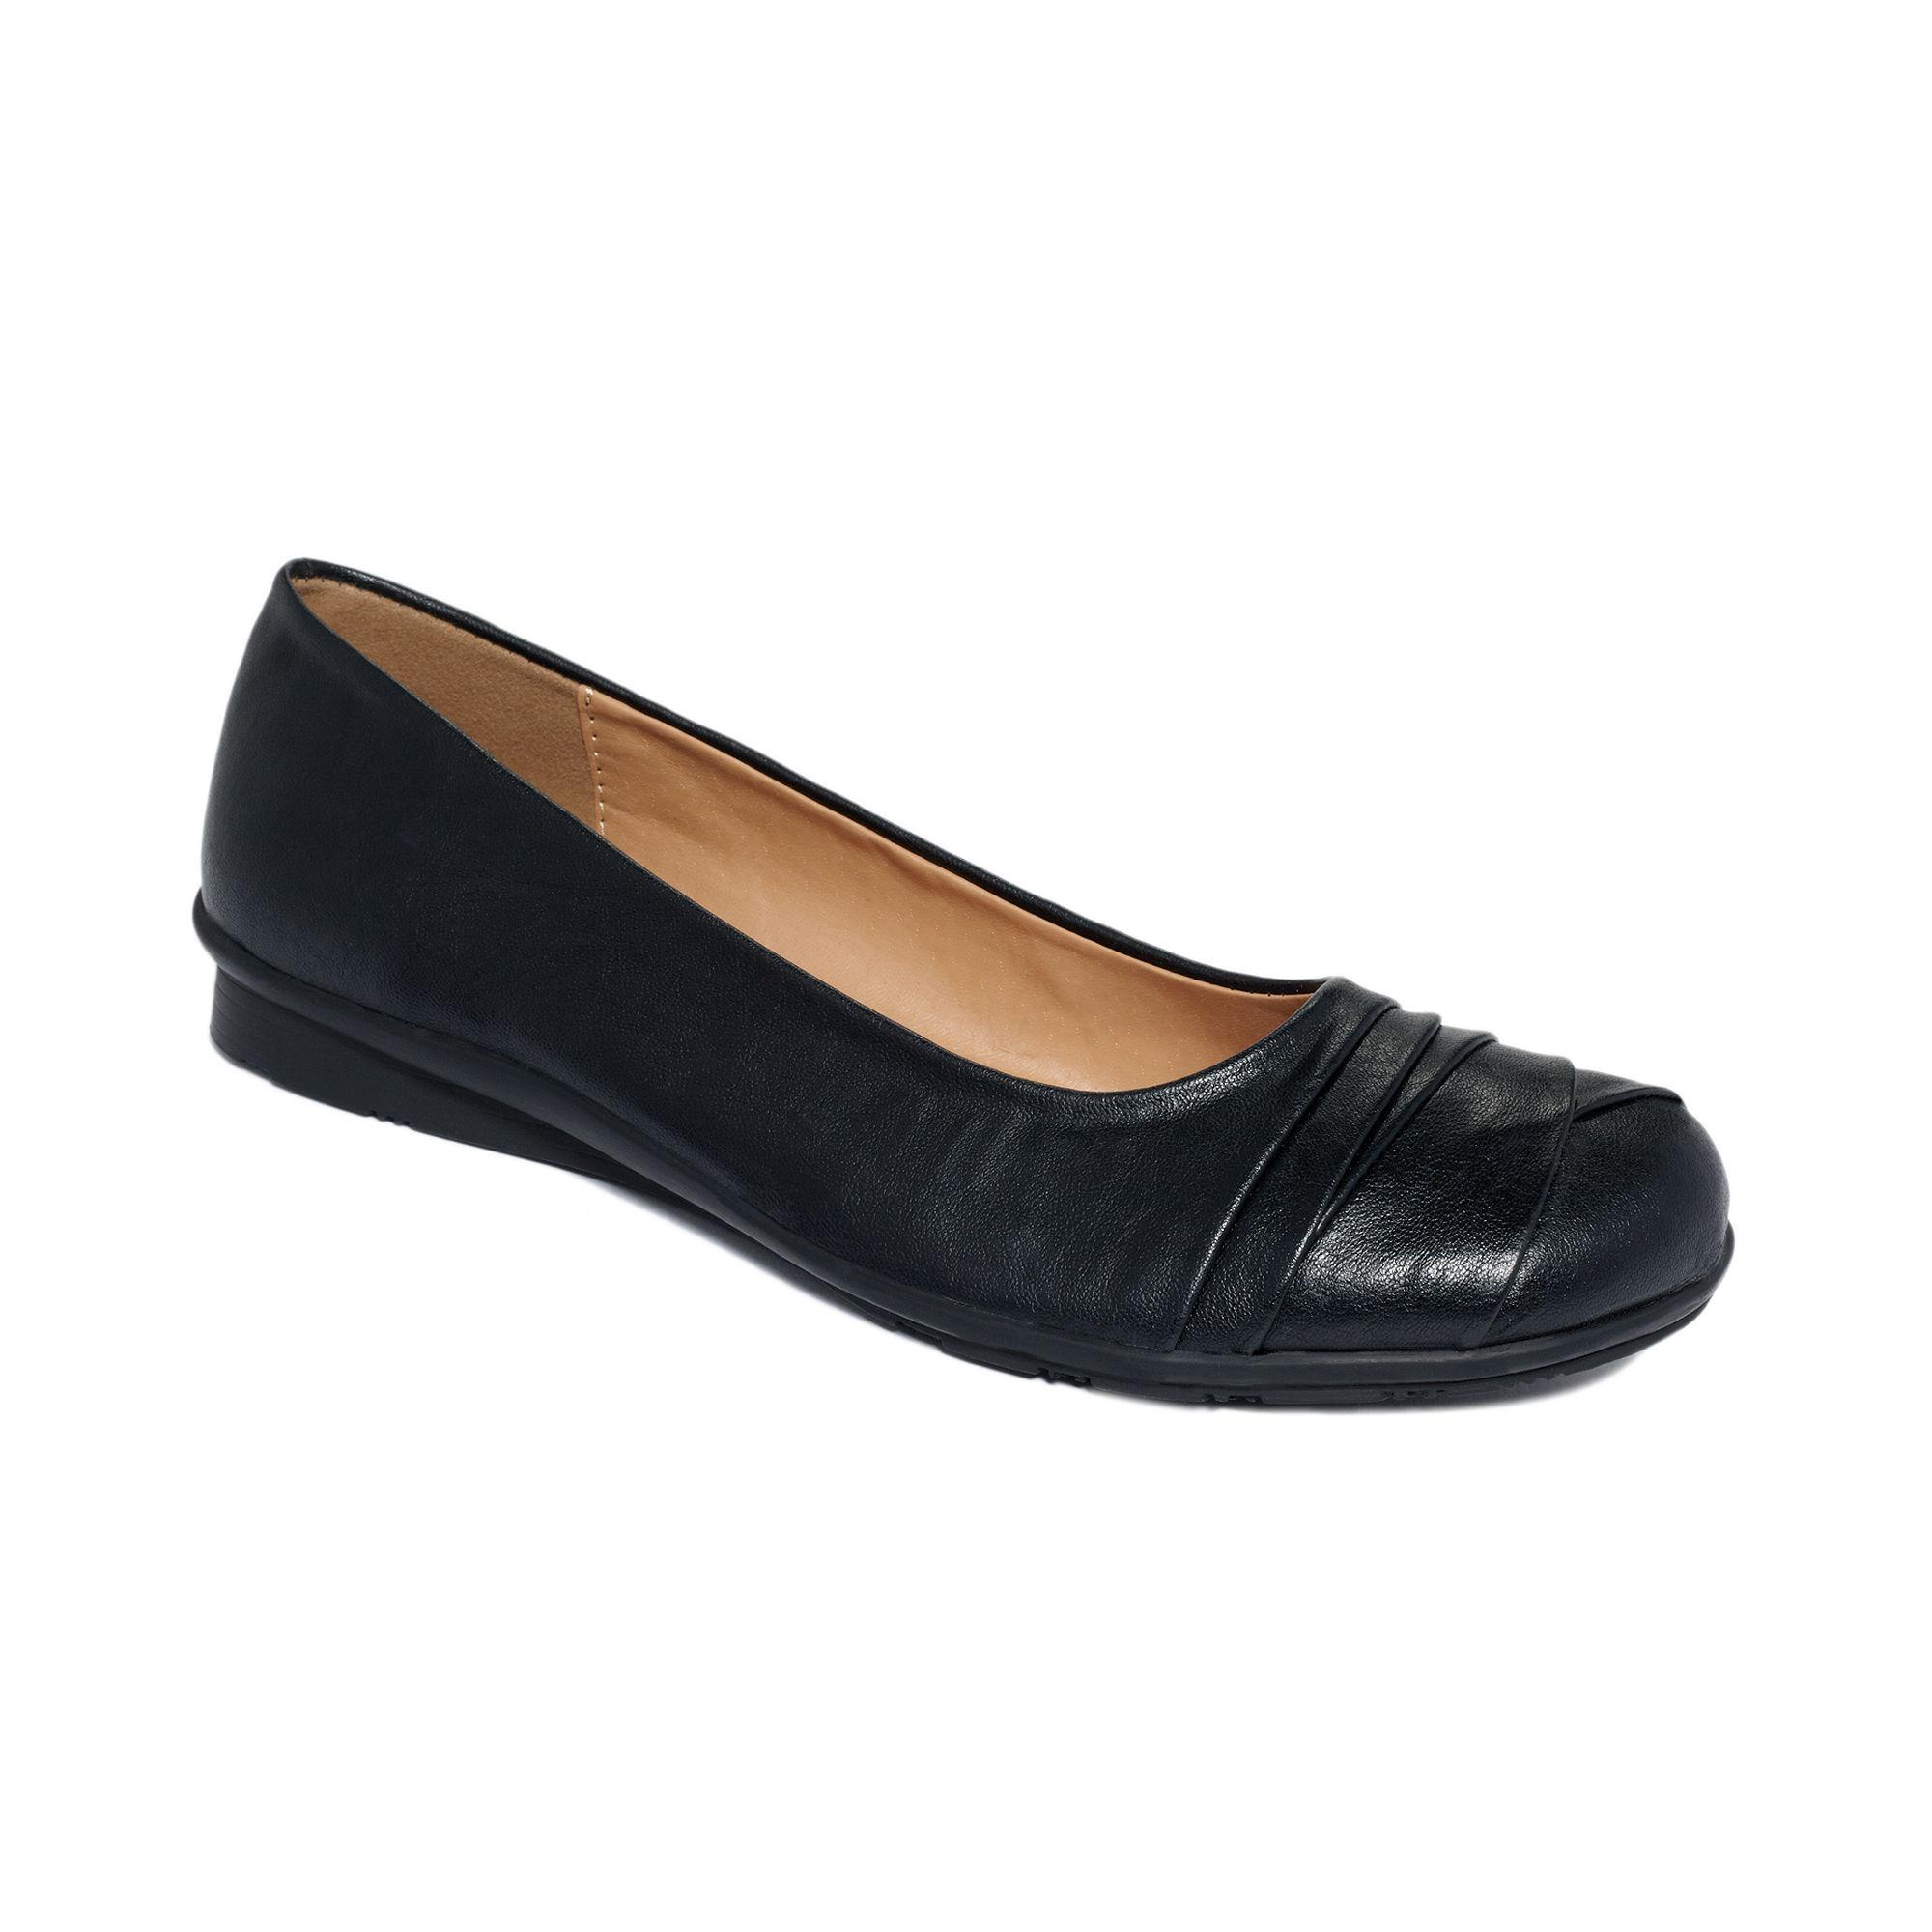 Chinese Dress Shoes Women